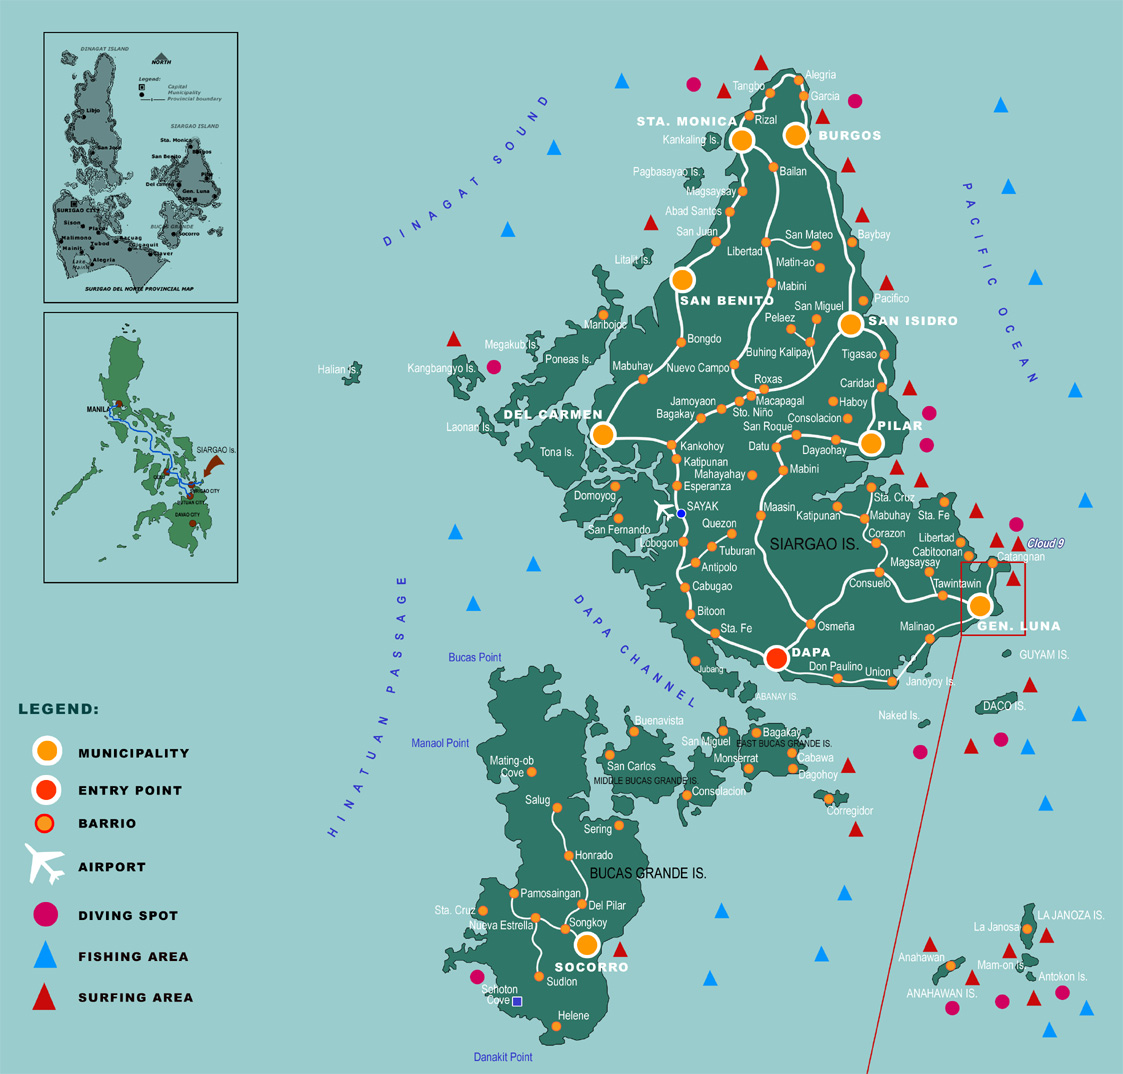 Siargao Map